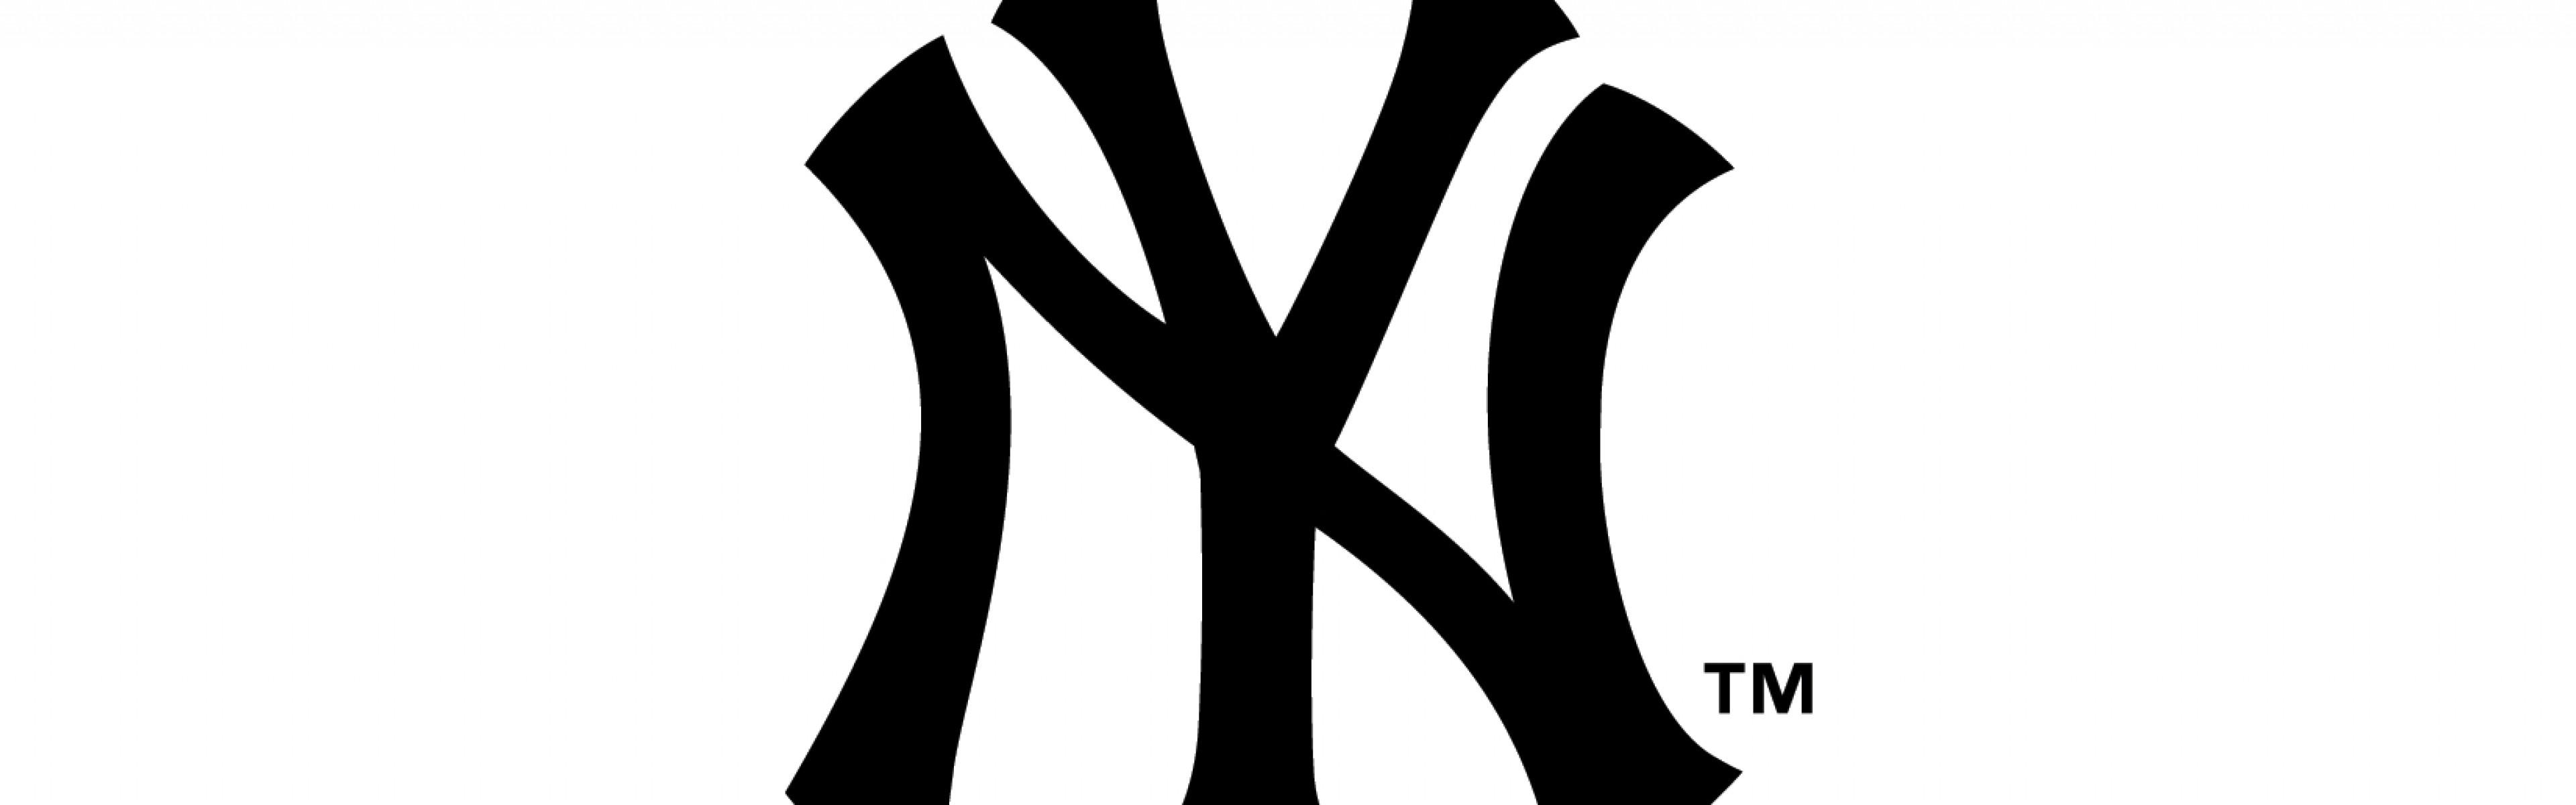 1920x1200 New York Yankees Wallpapers